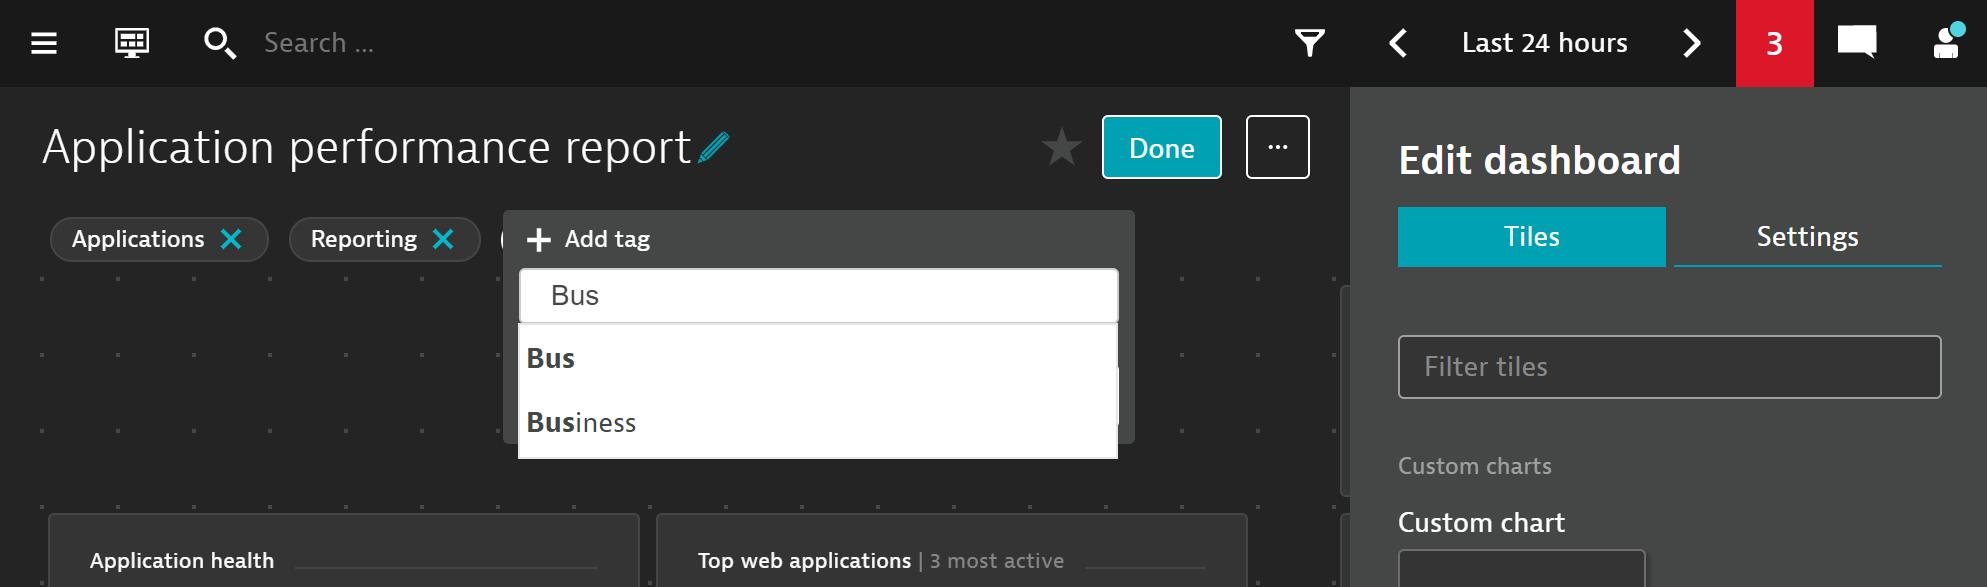 Add a tag when editing your dashboard